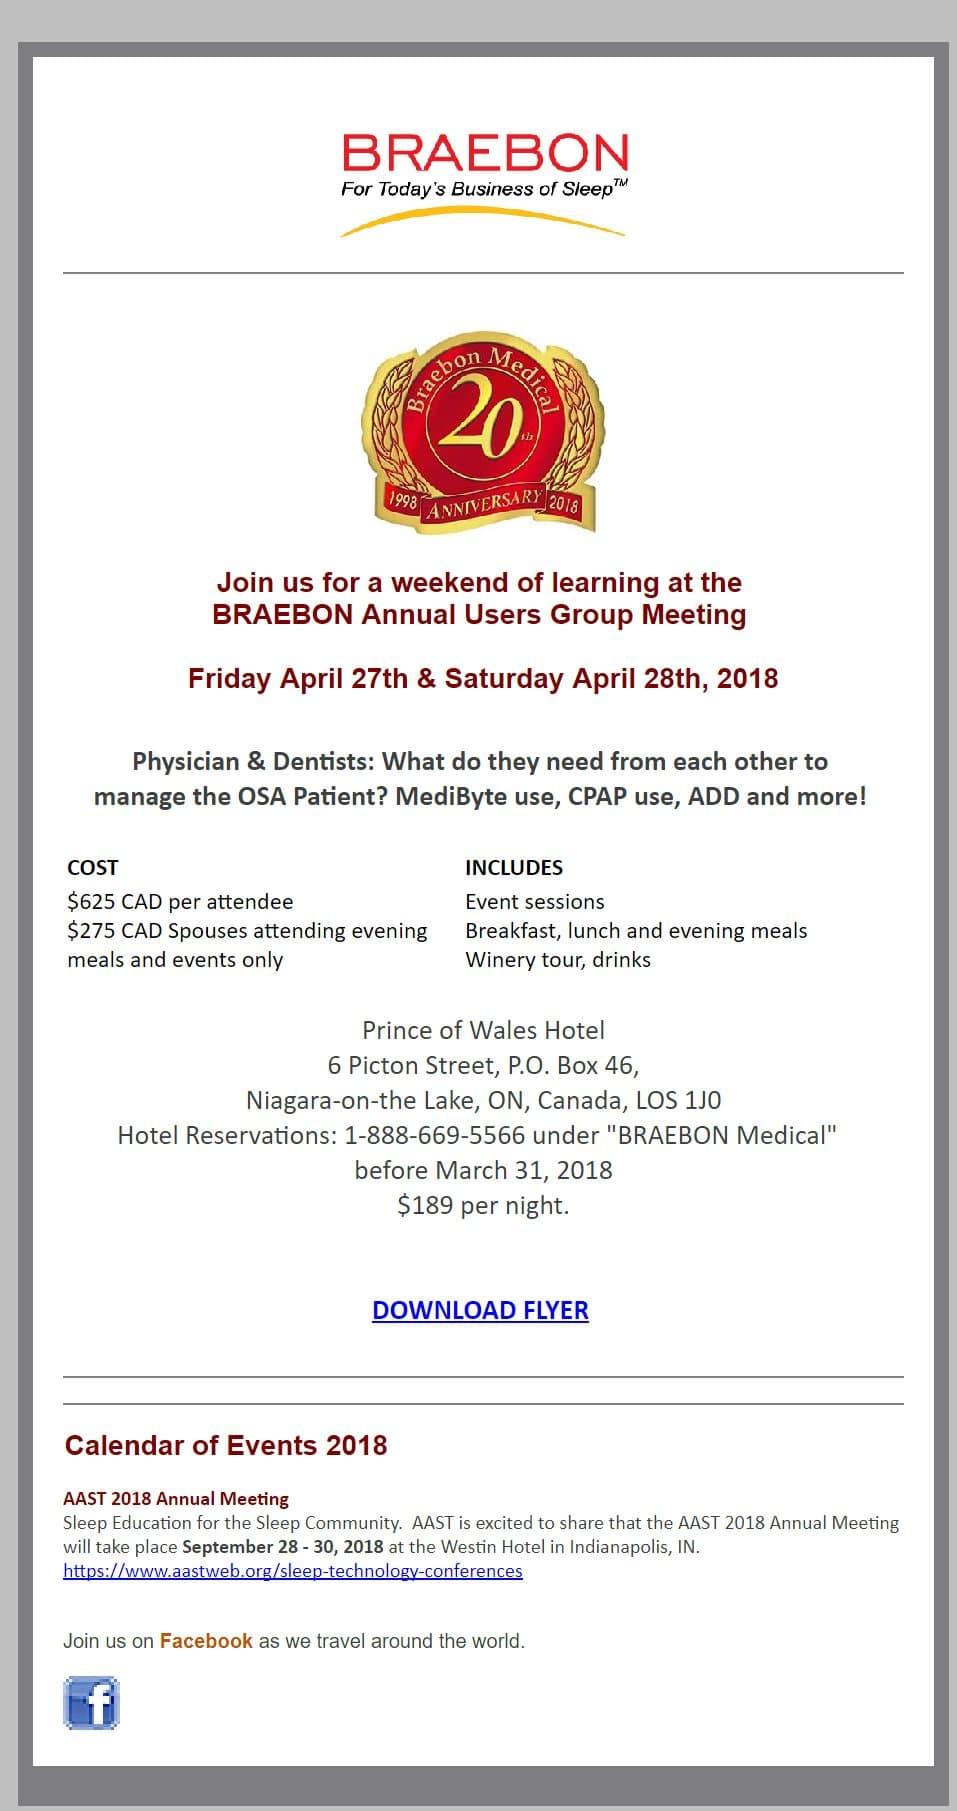 braebon 2019 users group